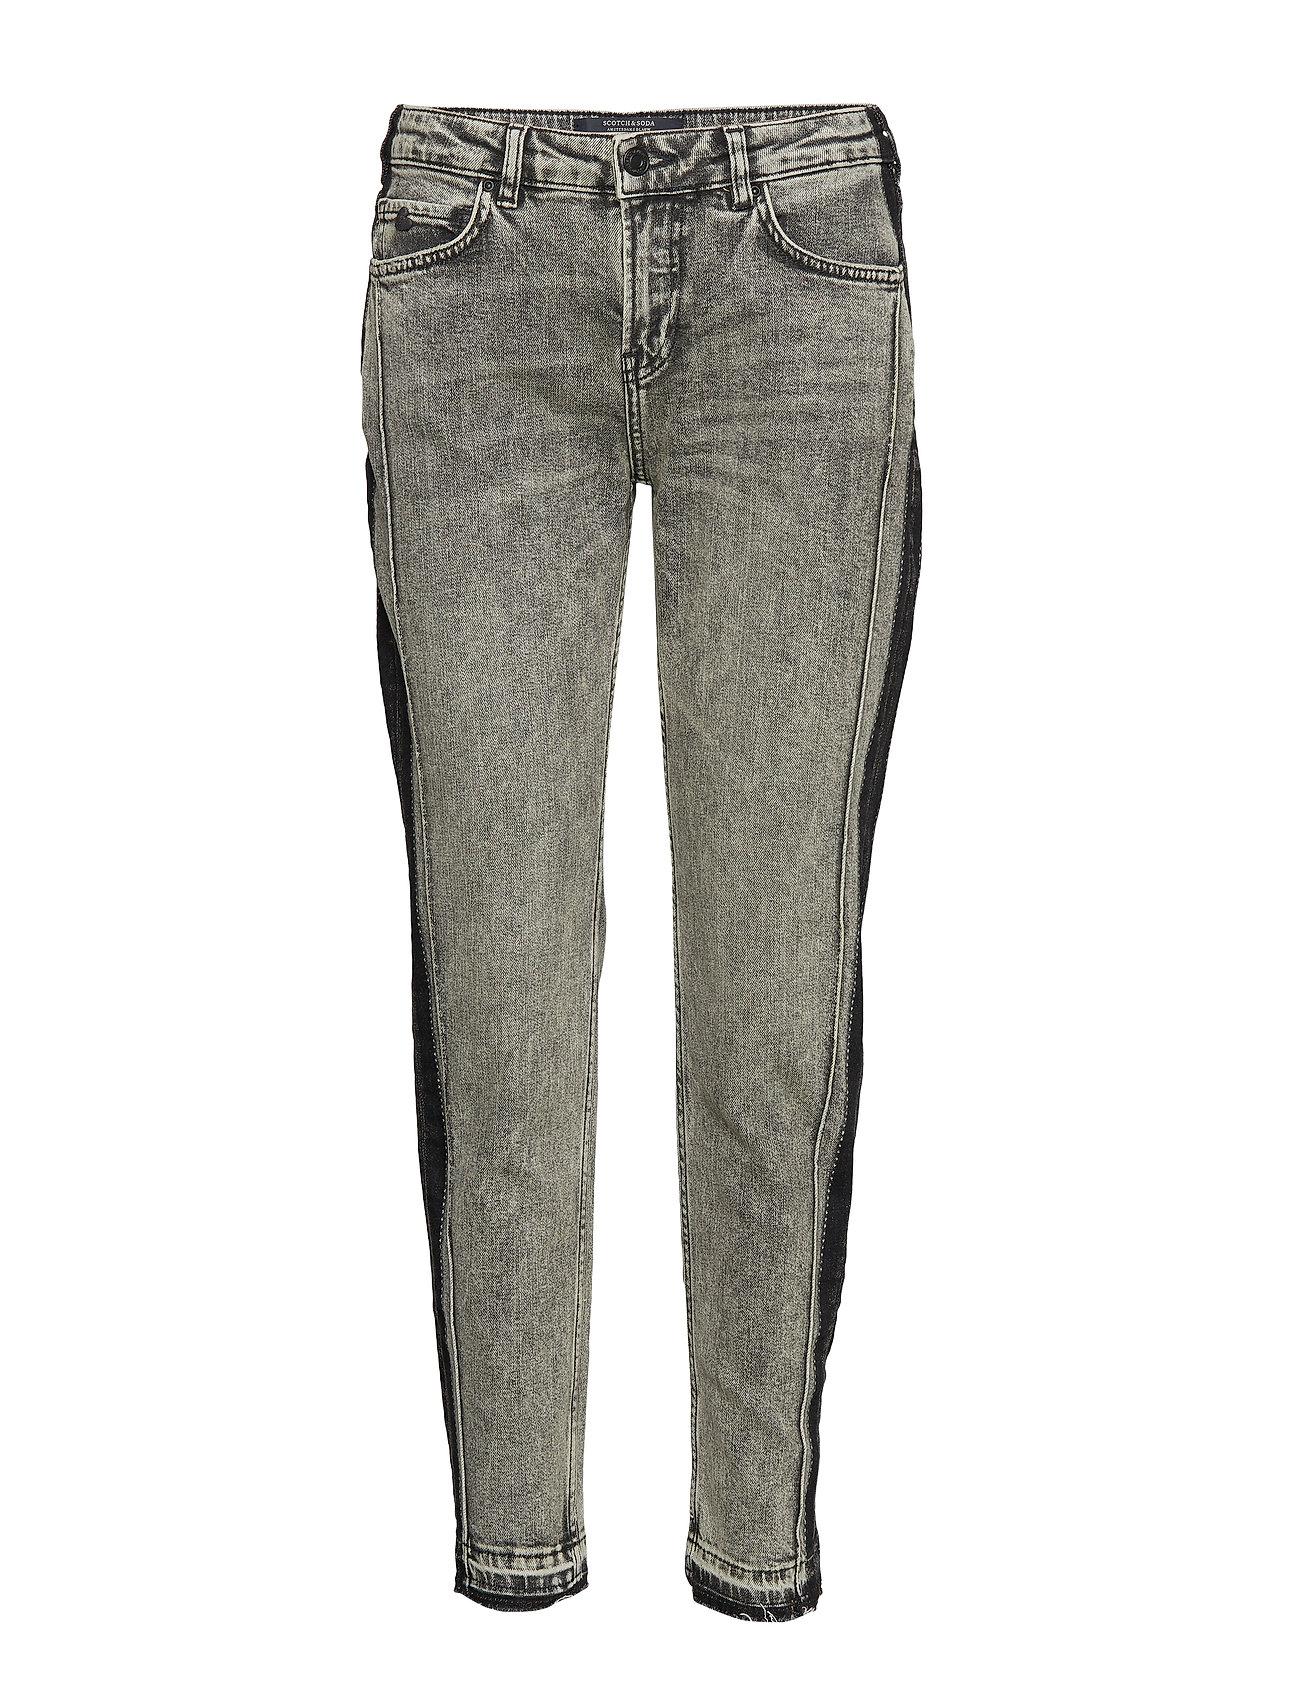 The Keeper - Customized Rock Straight Jeans Hose Mit Geradem Bein Grau SCOTCH & SODA